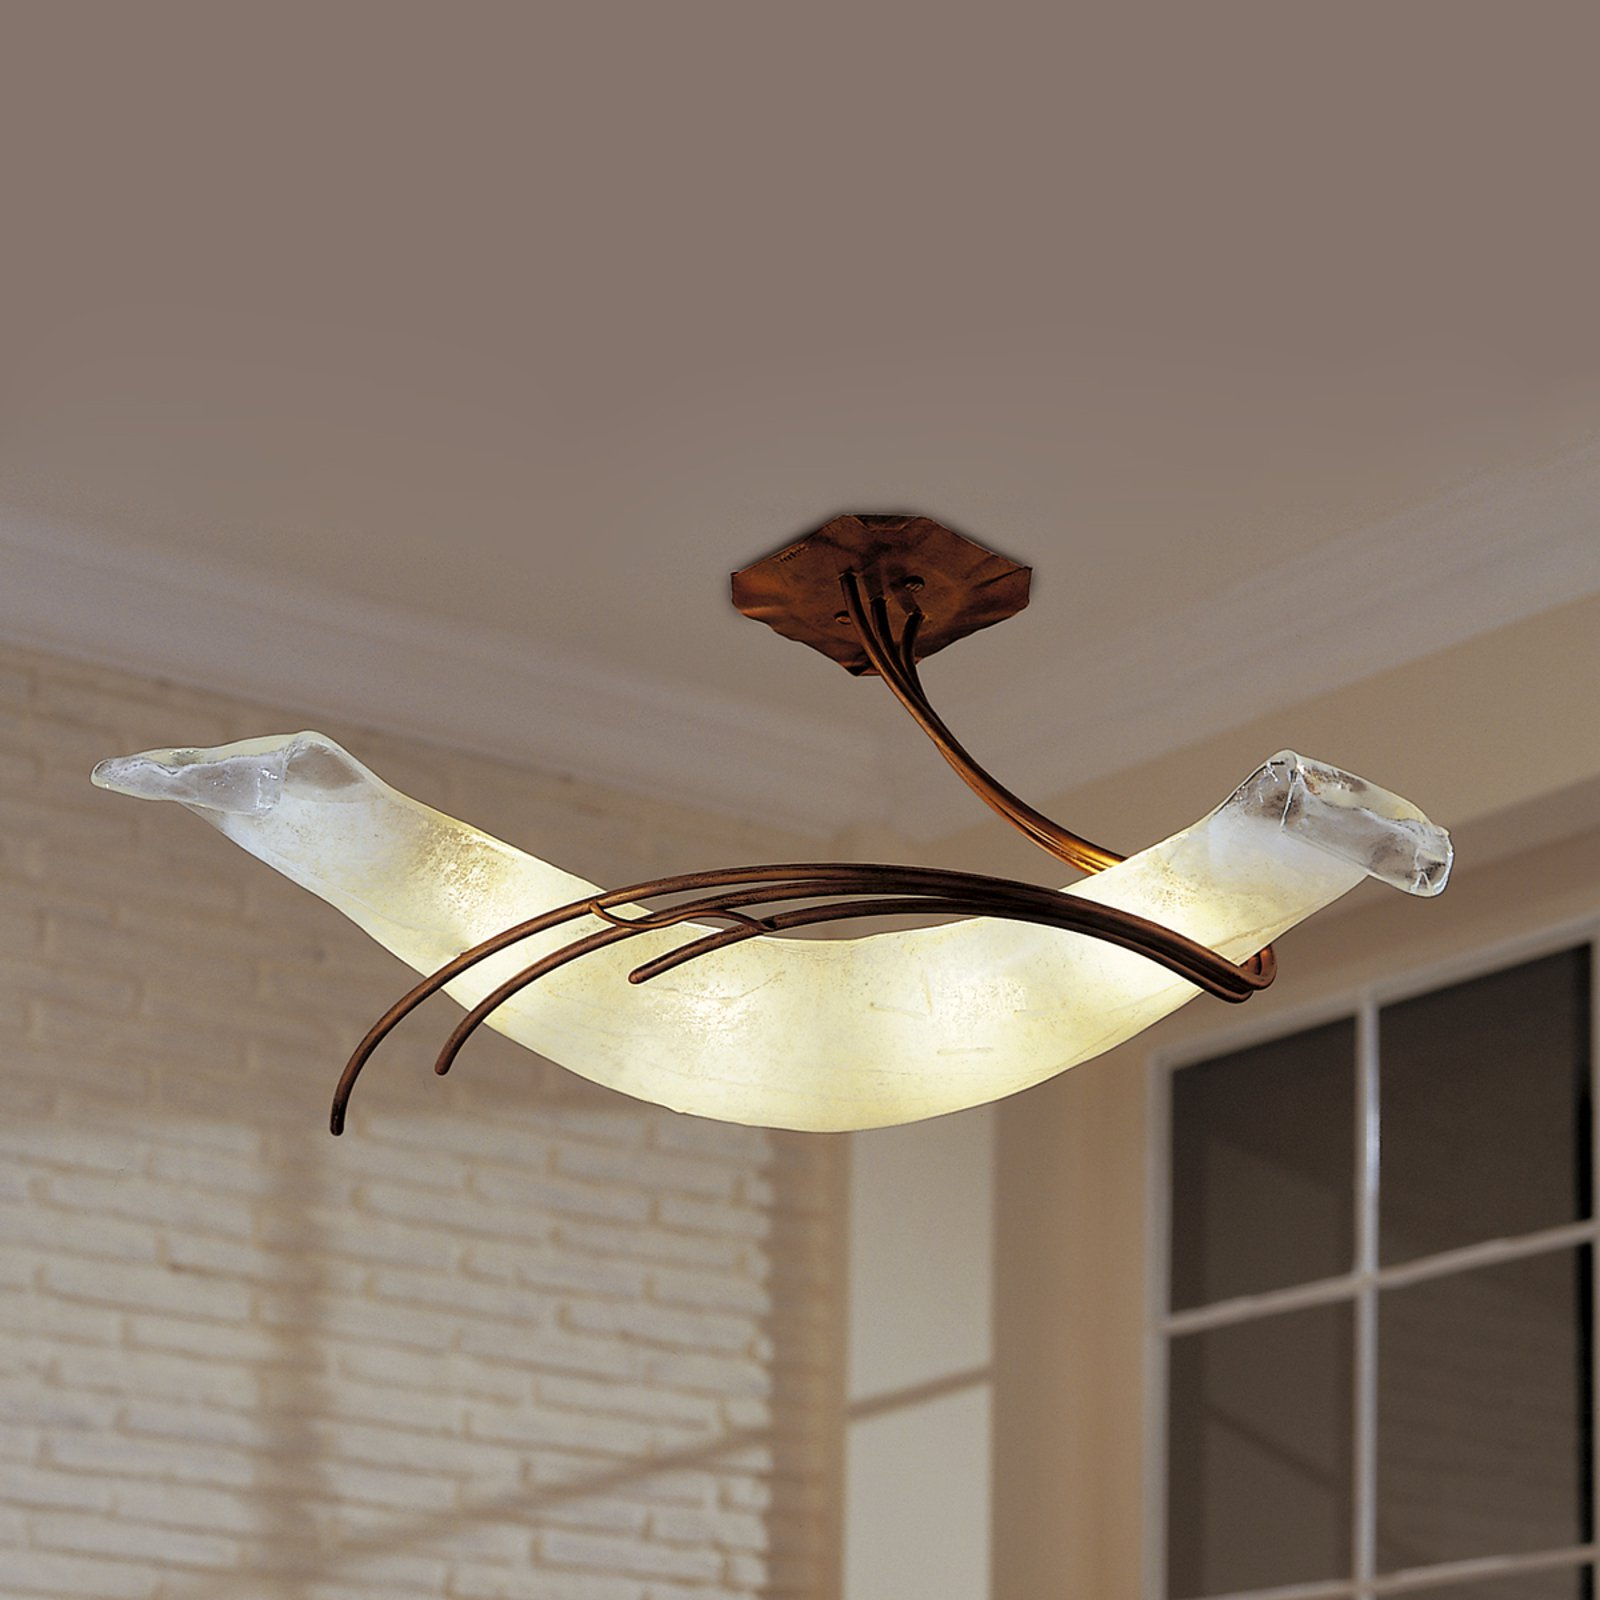 ROMA 30 designer-taklampe